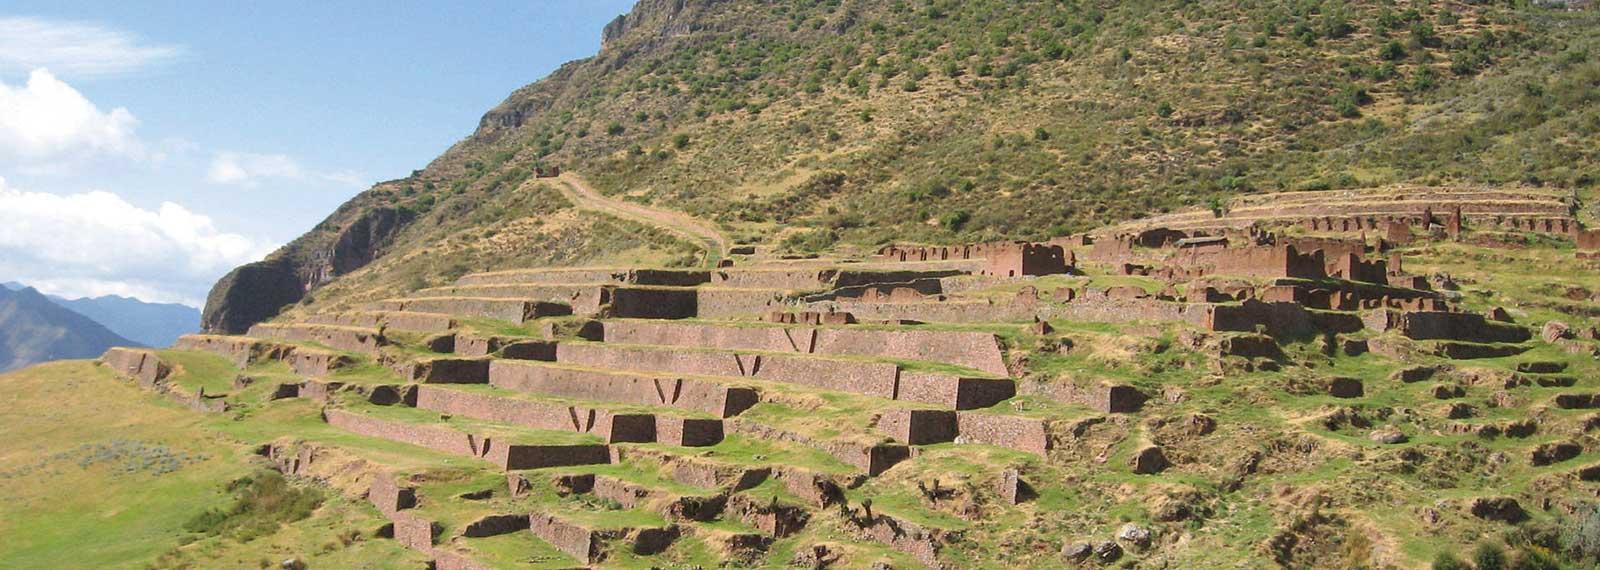 Huchuy Qosqo Trek in the sacred valley